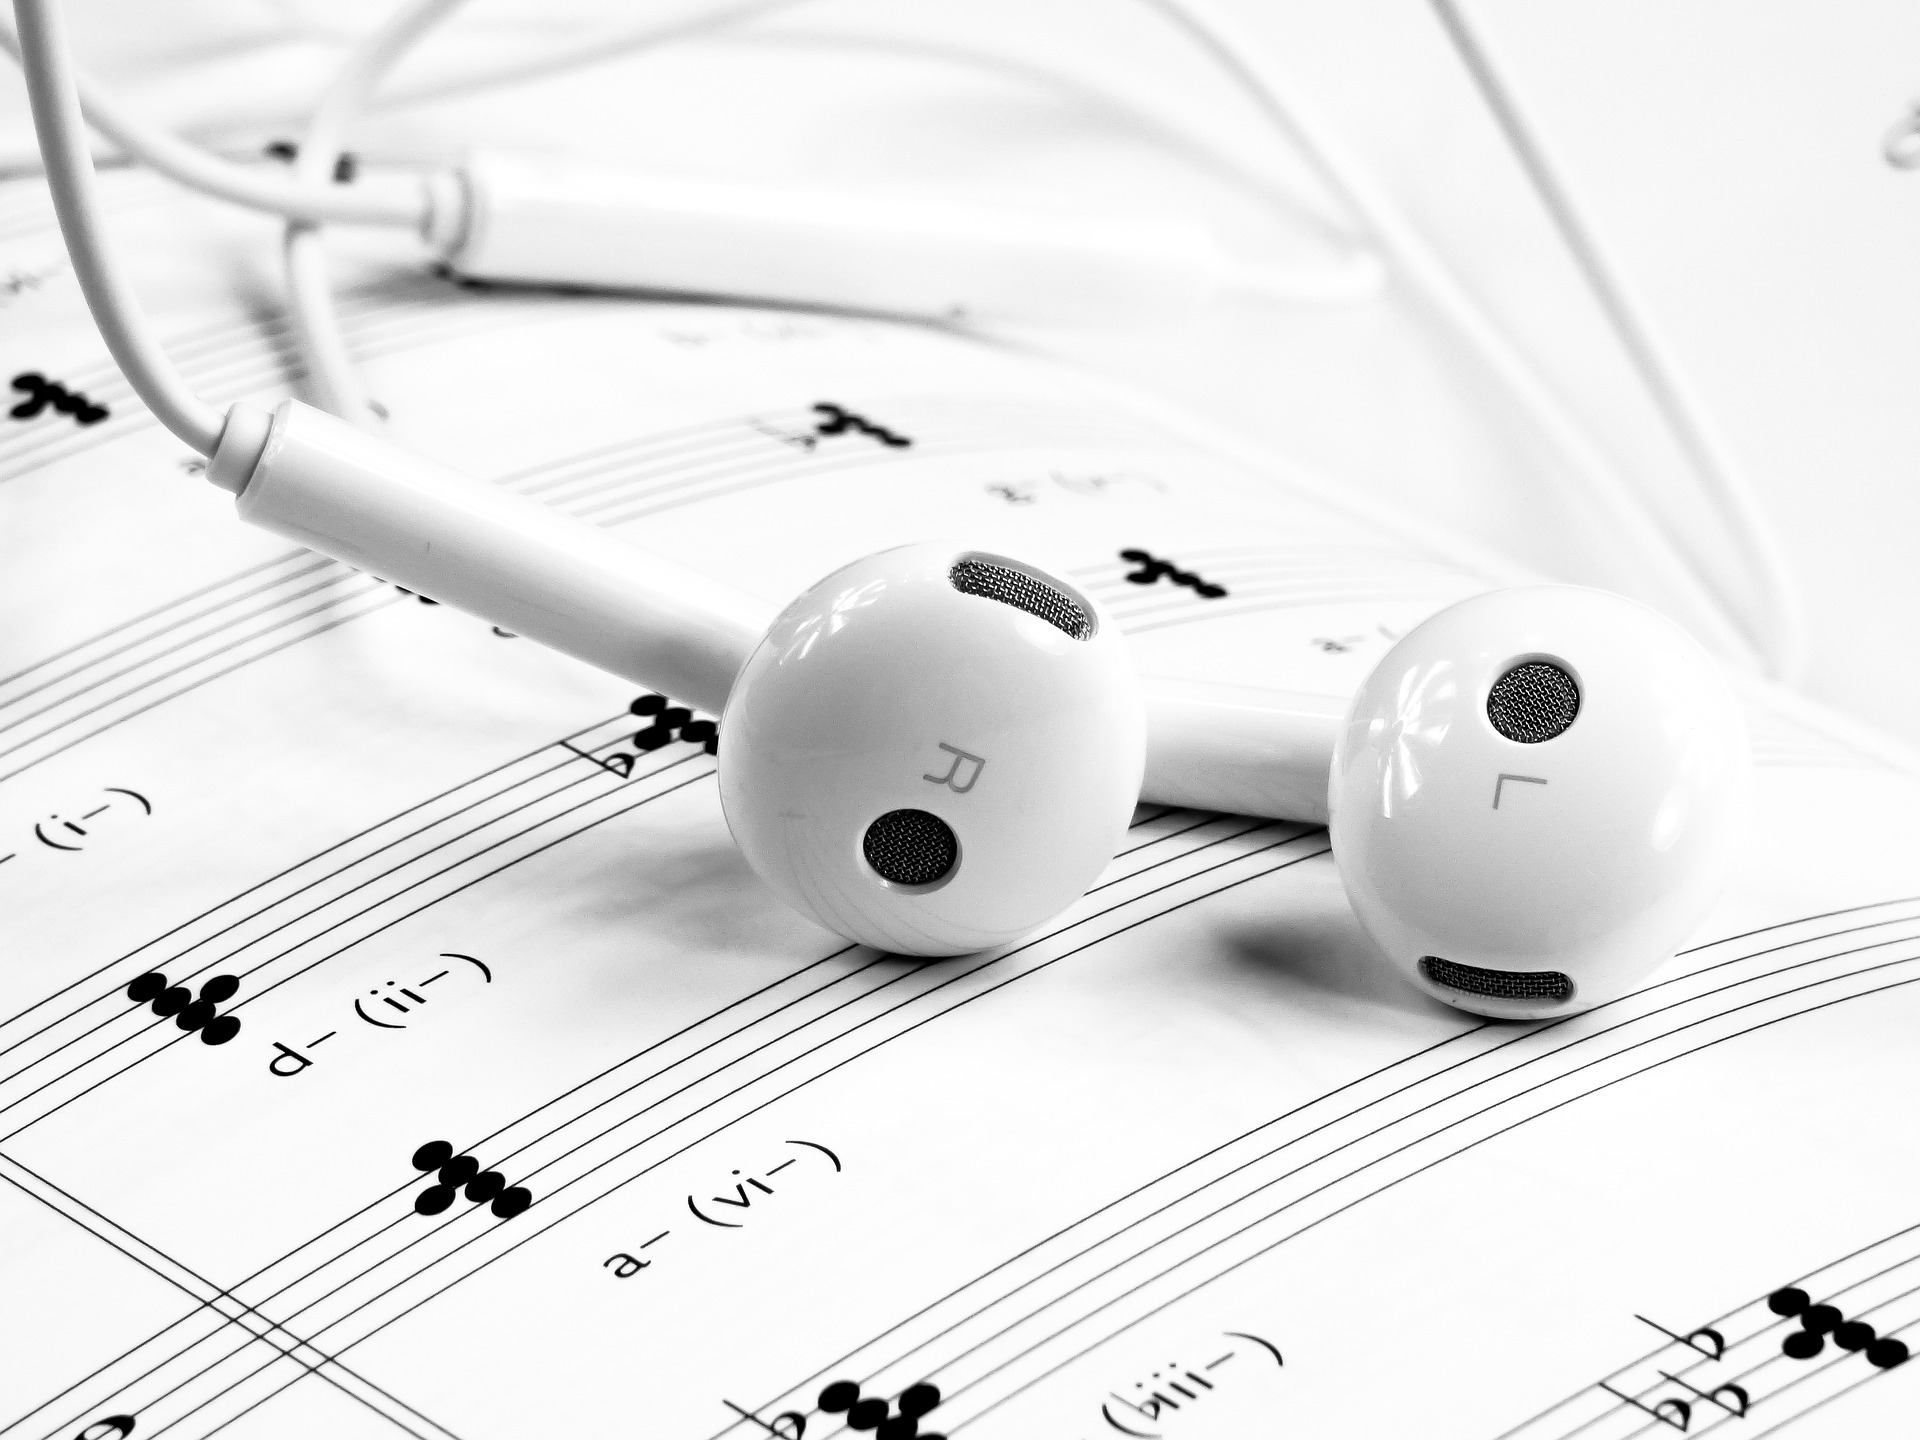 White headphones, gadgets for women